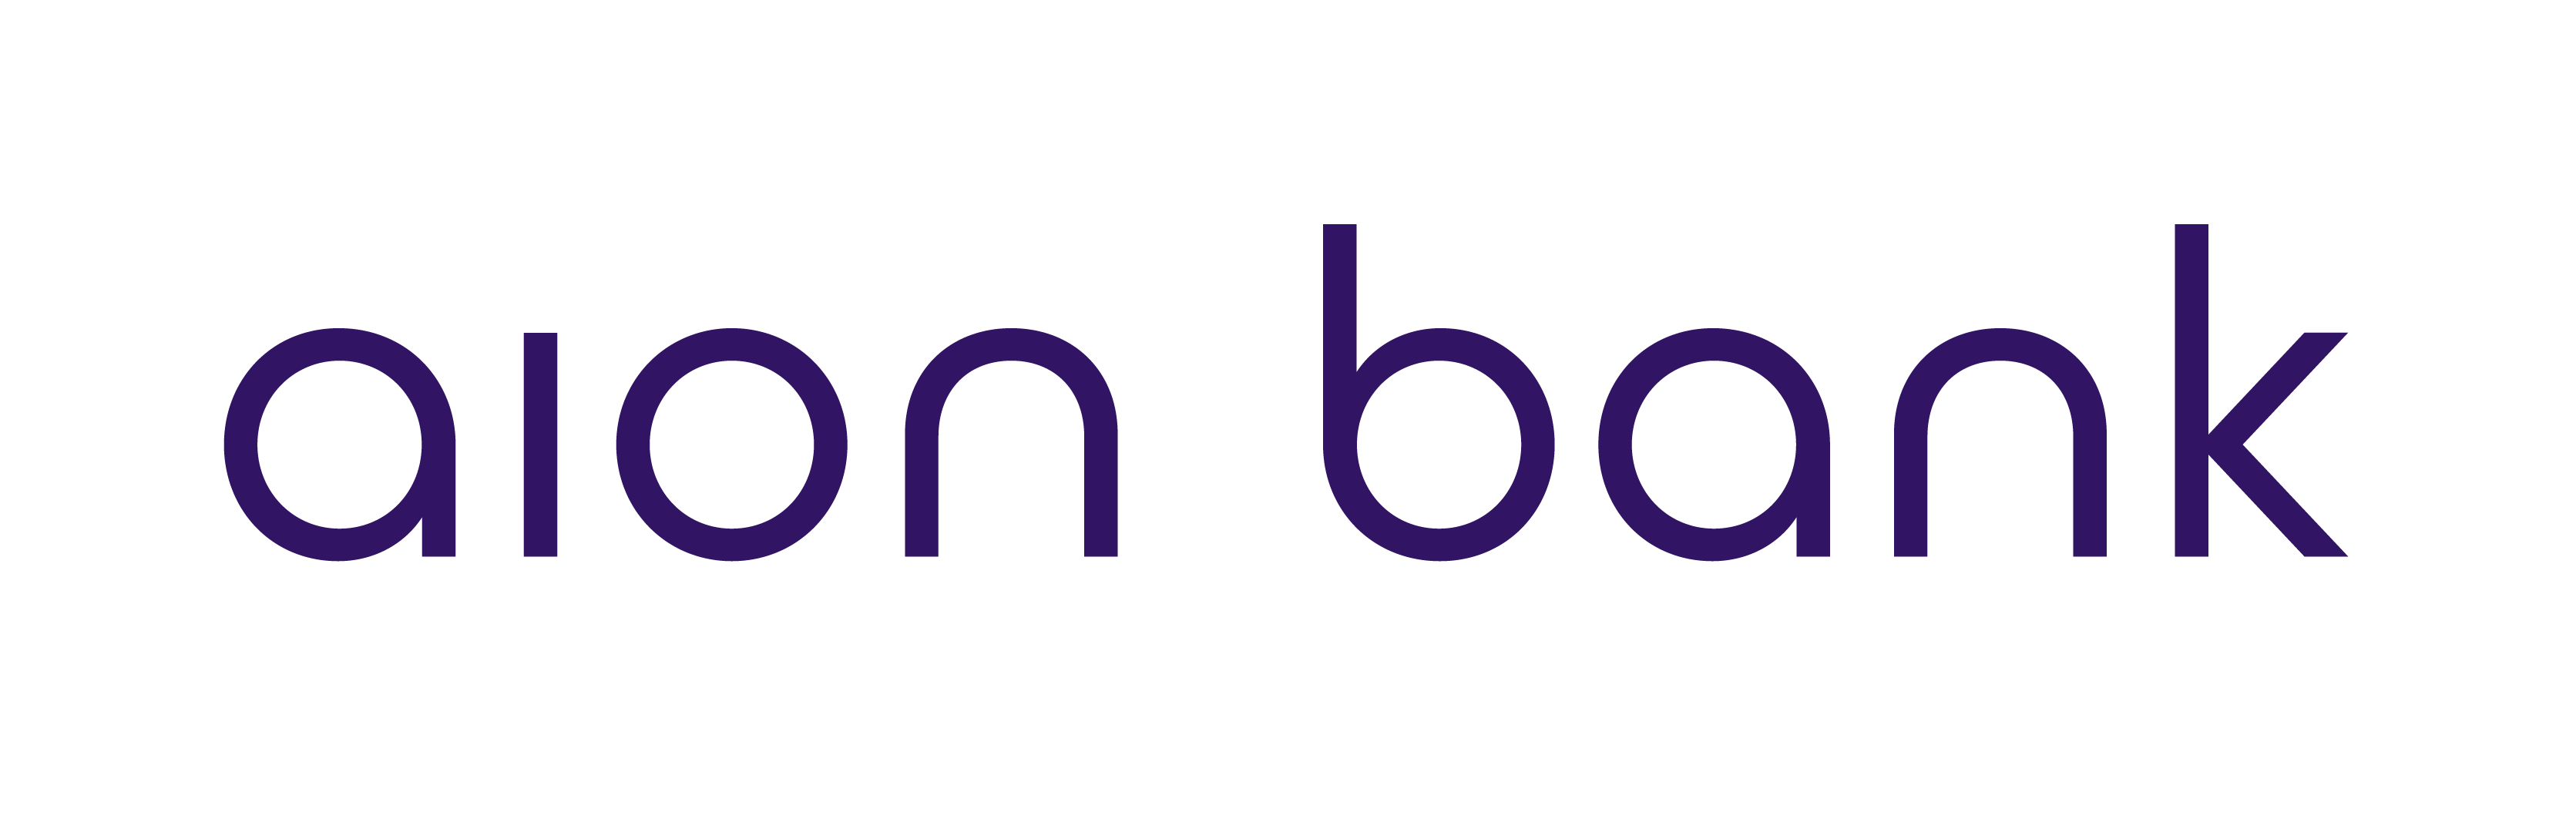 Aion Bank's logo